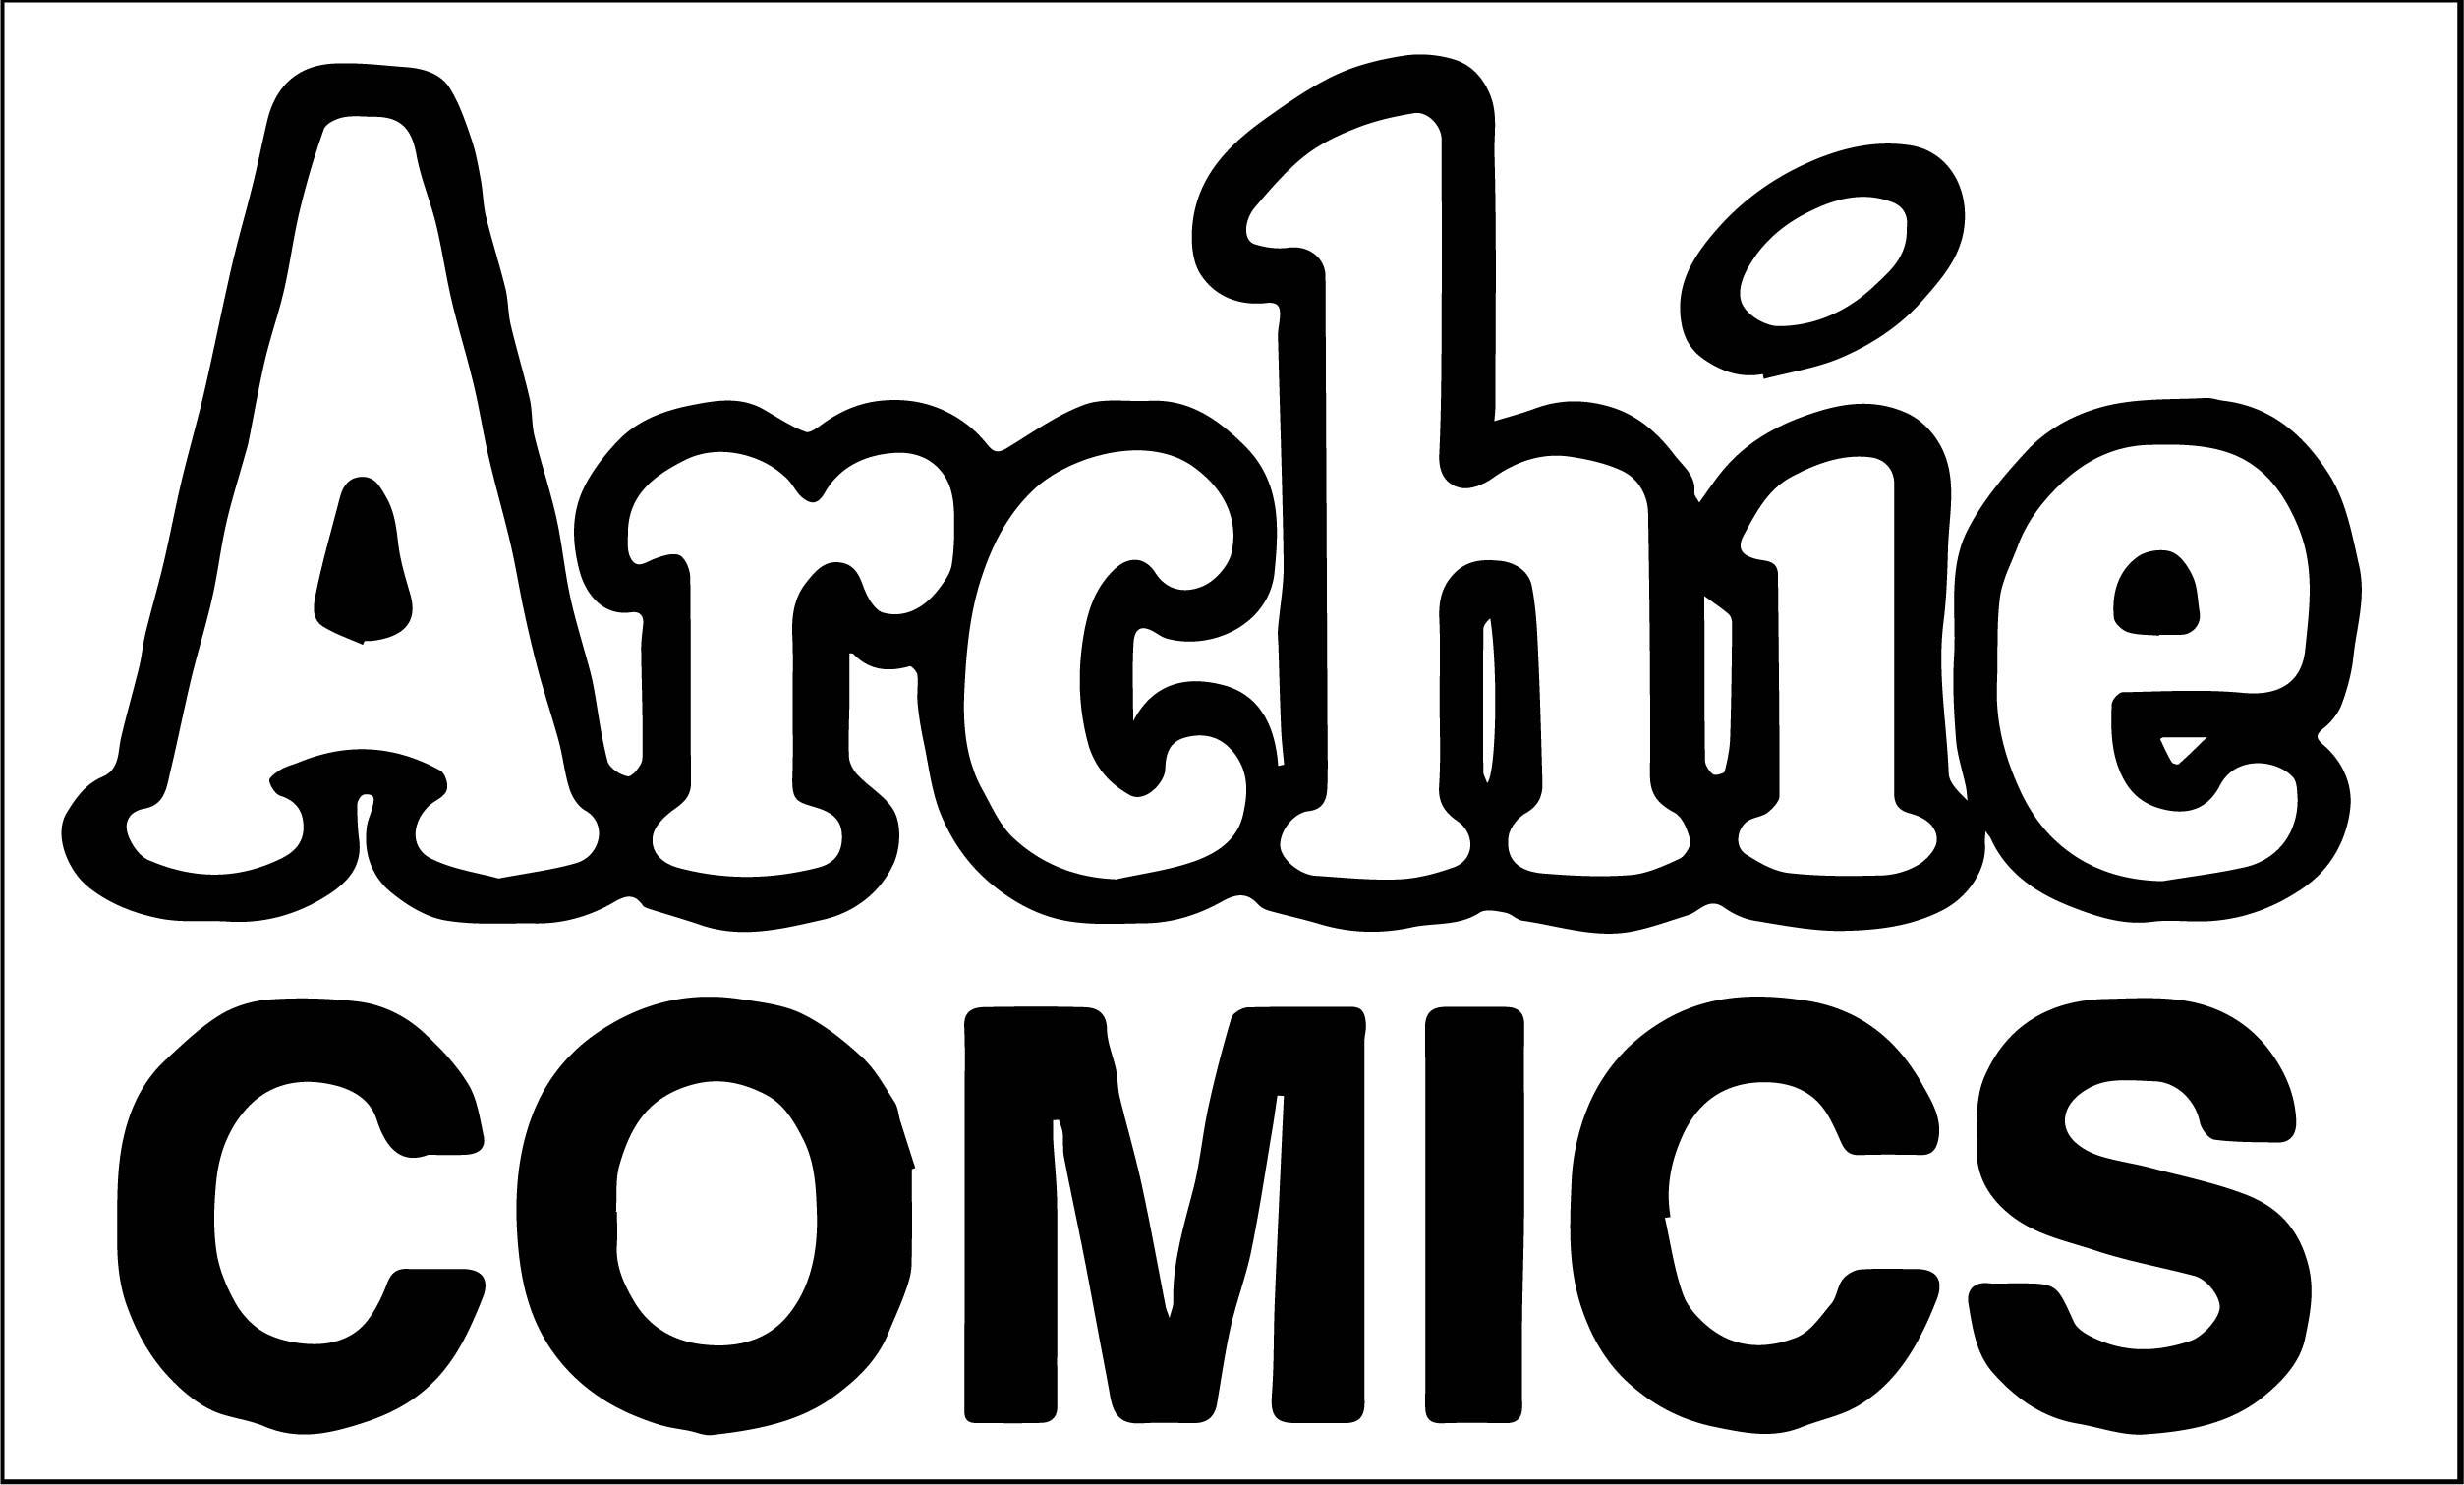 Archie Comics Logo Coloring Page